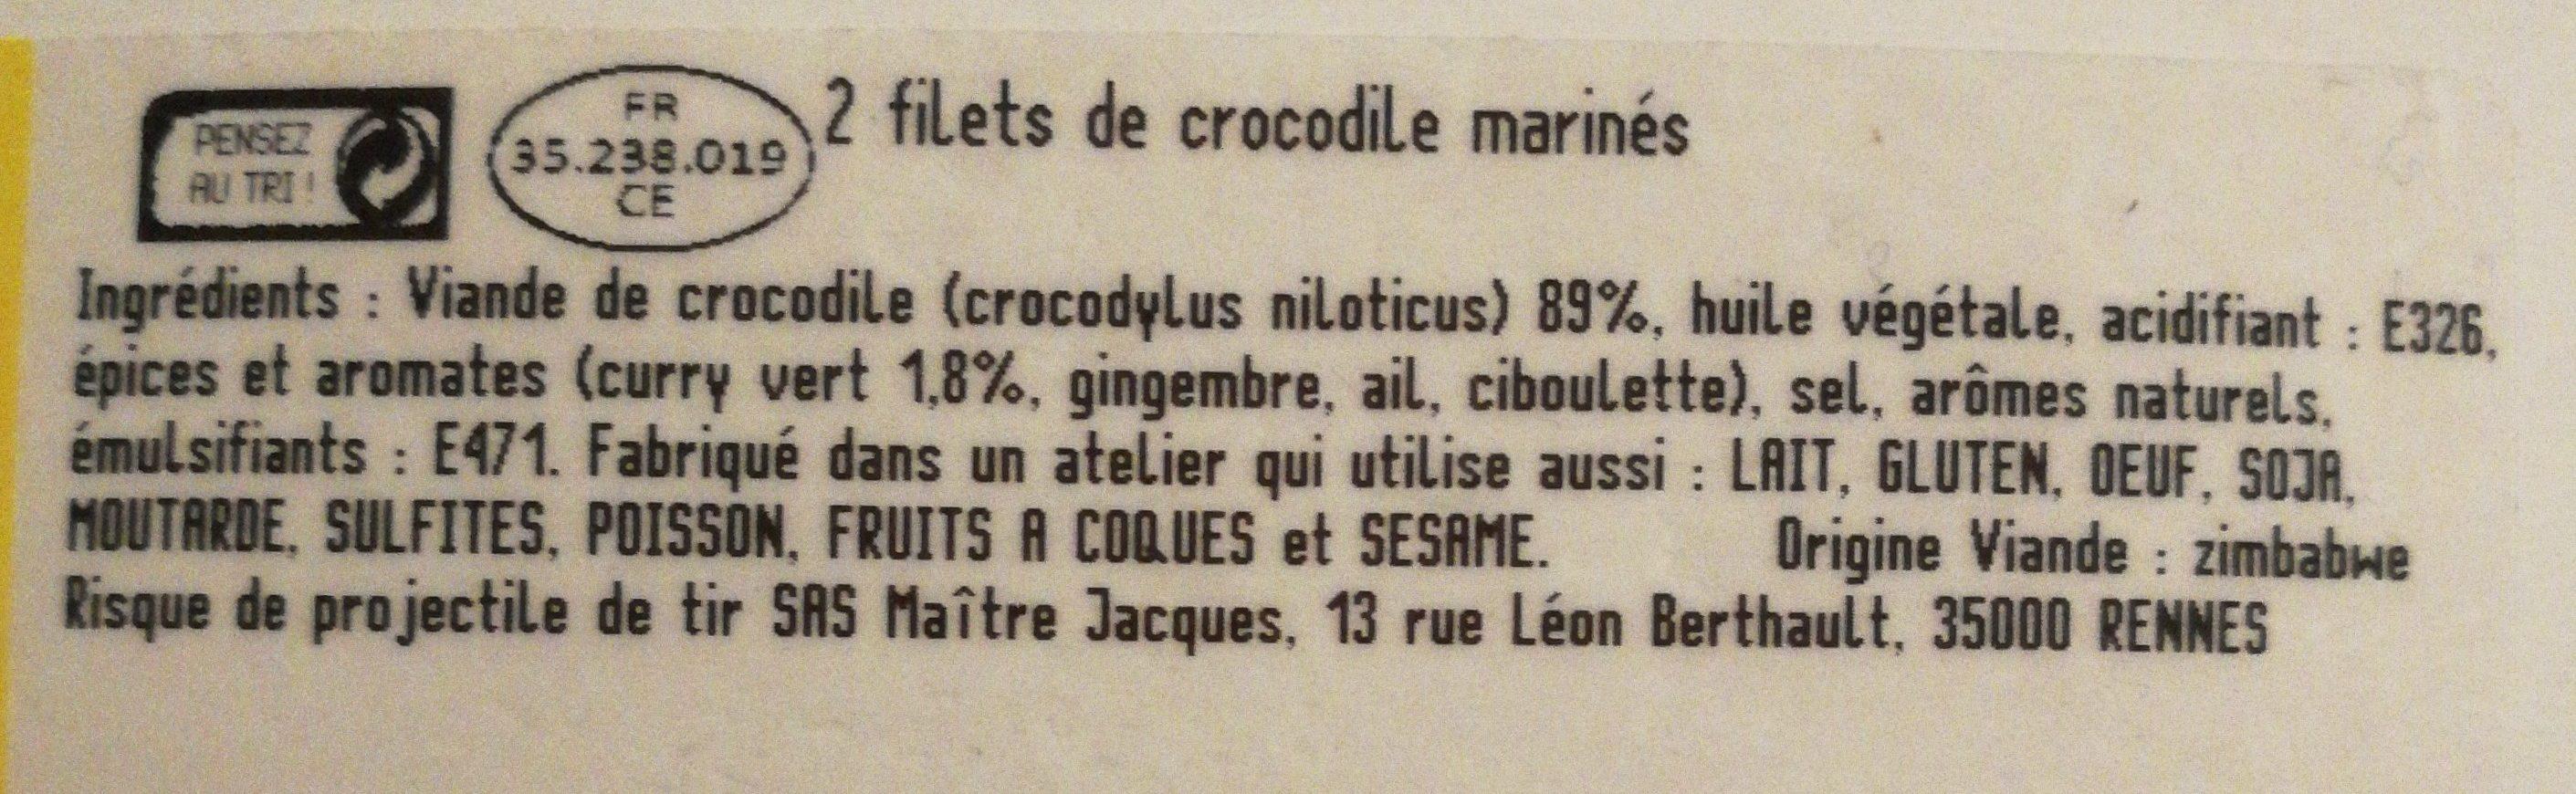 2 Filets de Crocodile marinés - Ingredients - fr